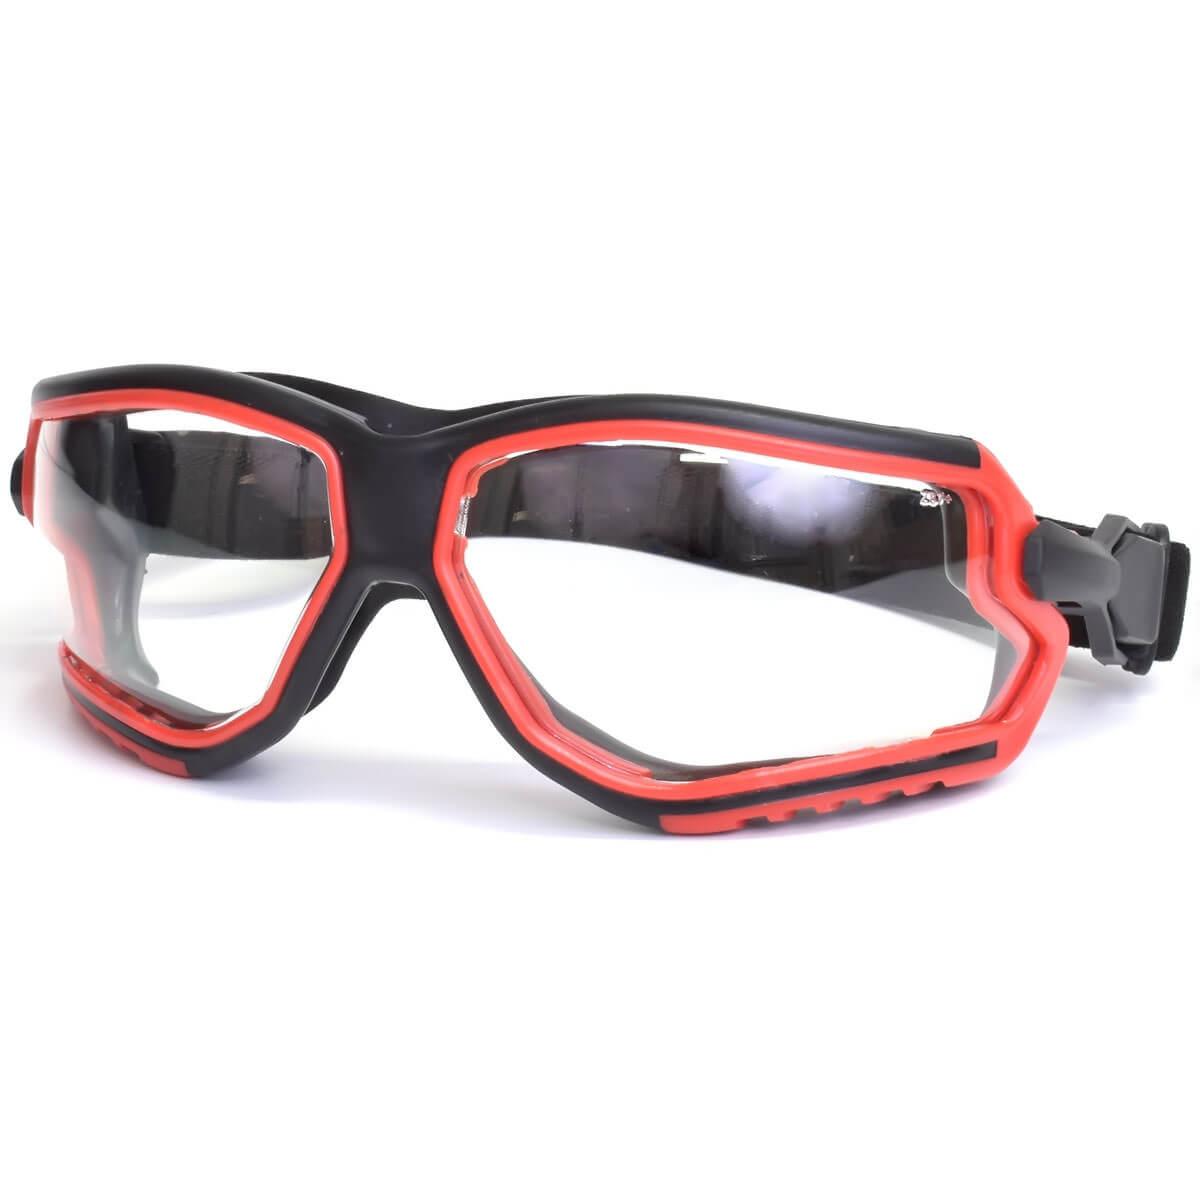 Óculos de Segurança Lente Incolor Predador VIC52310 Vicsa 771995a07a